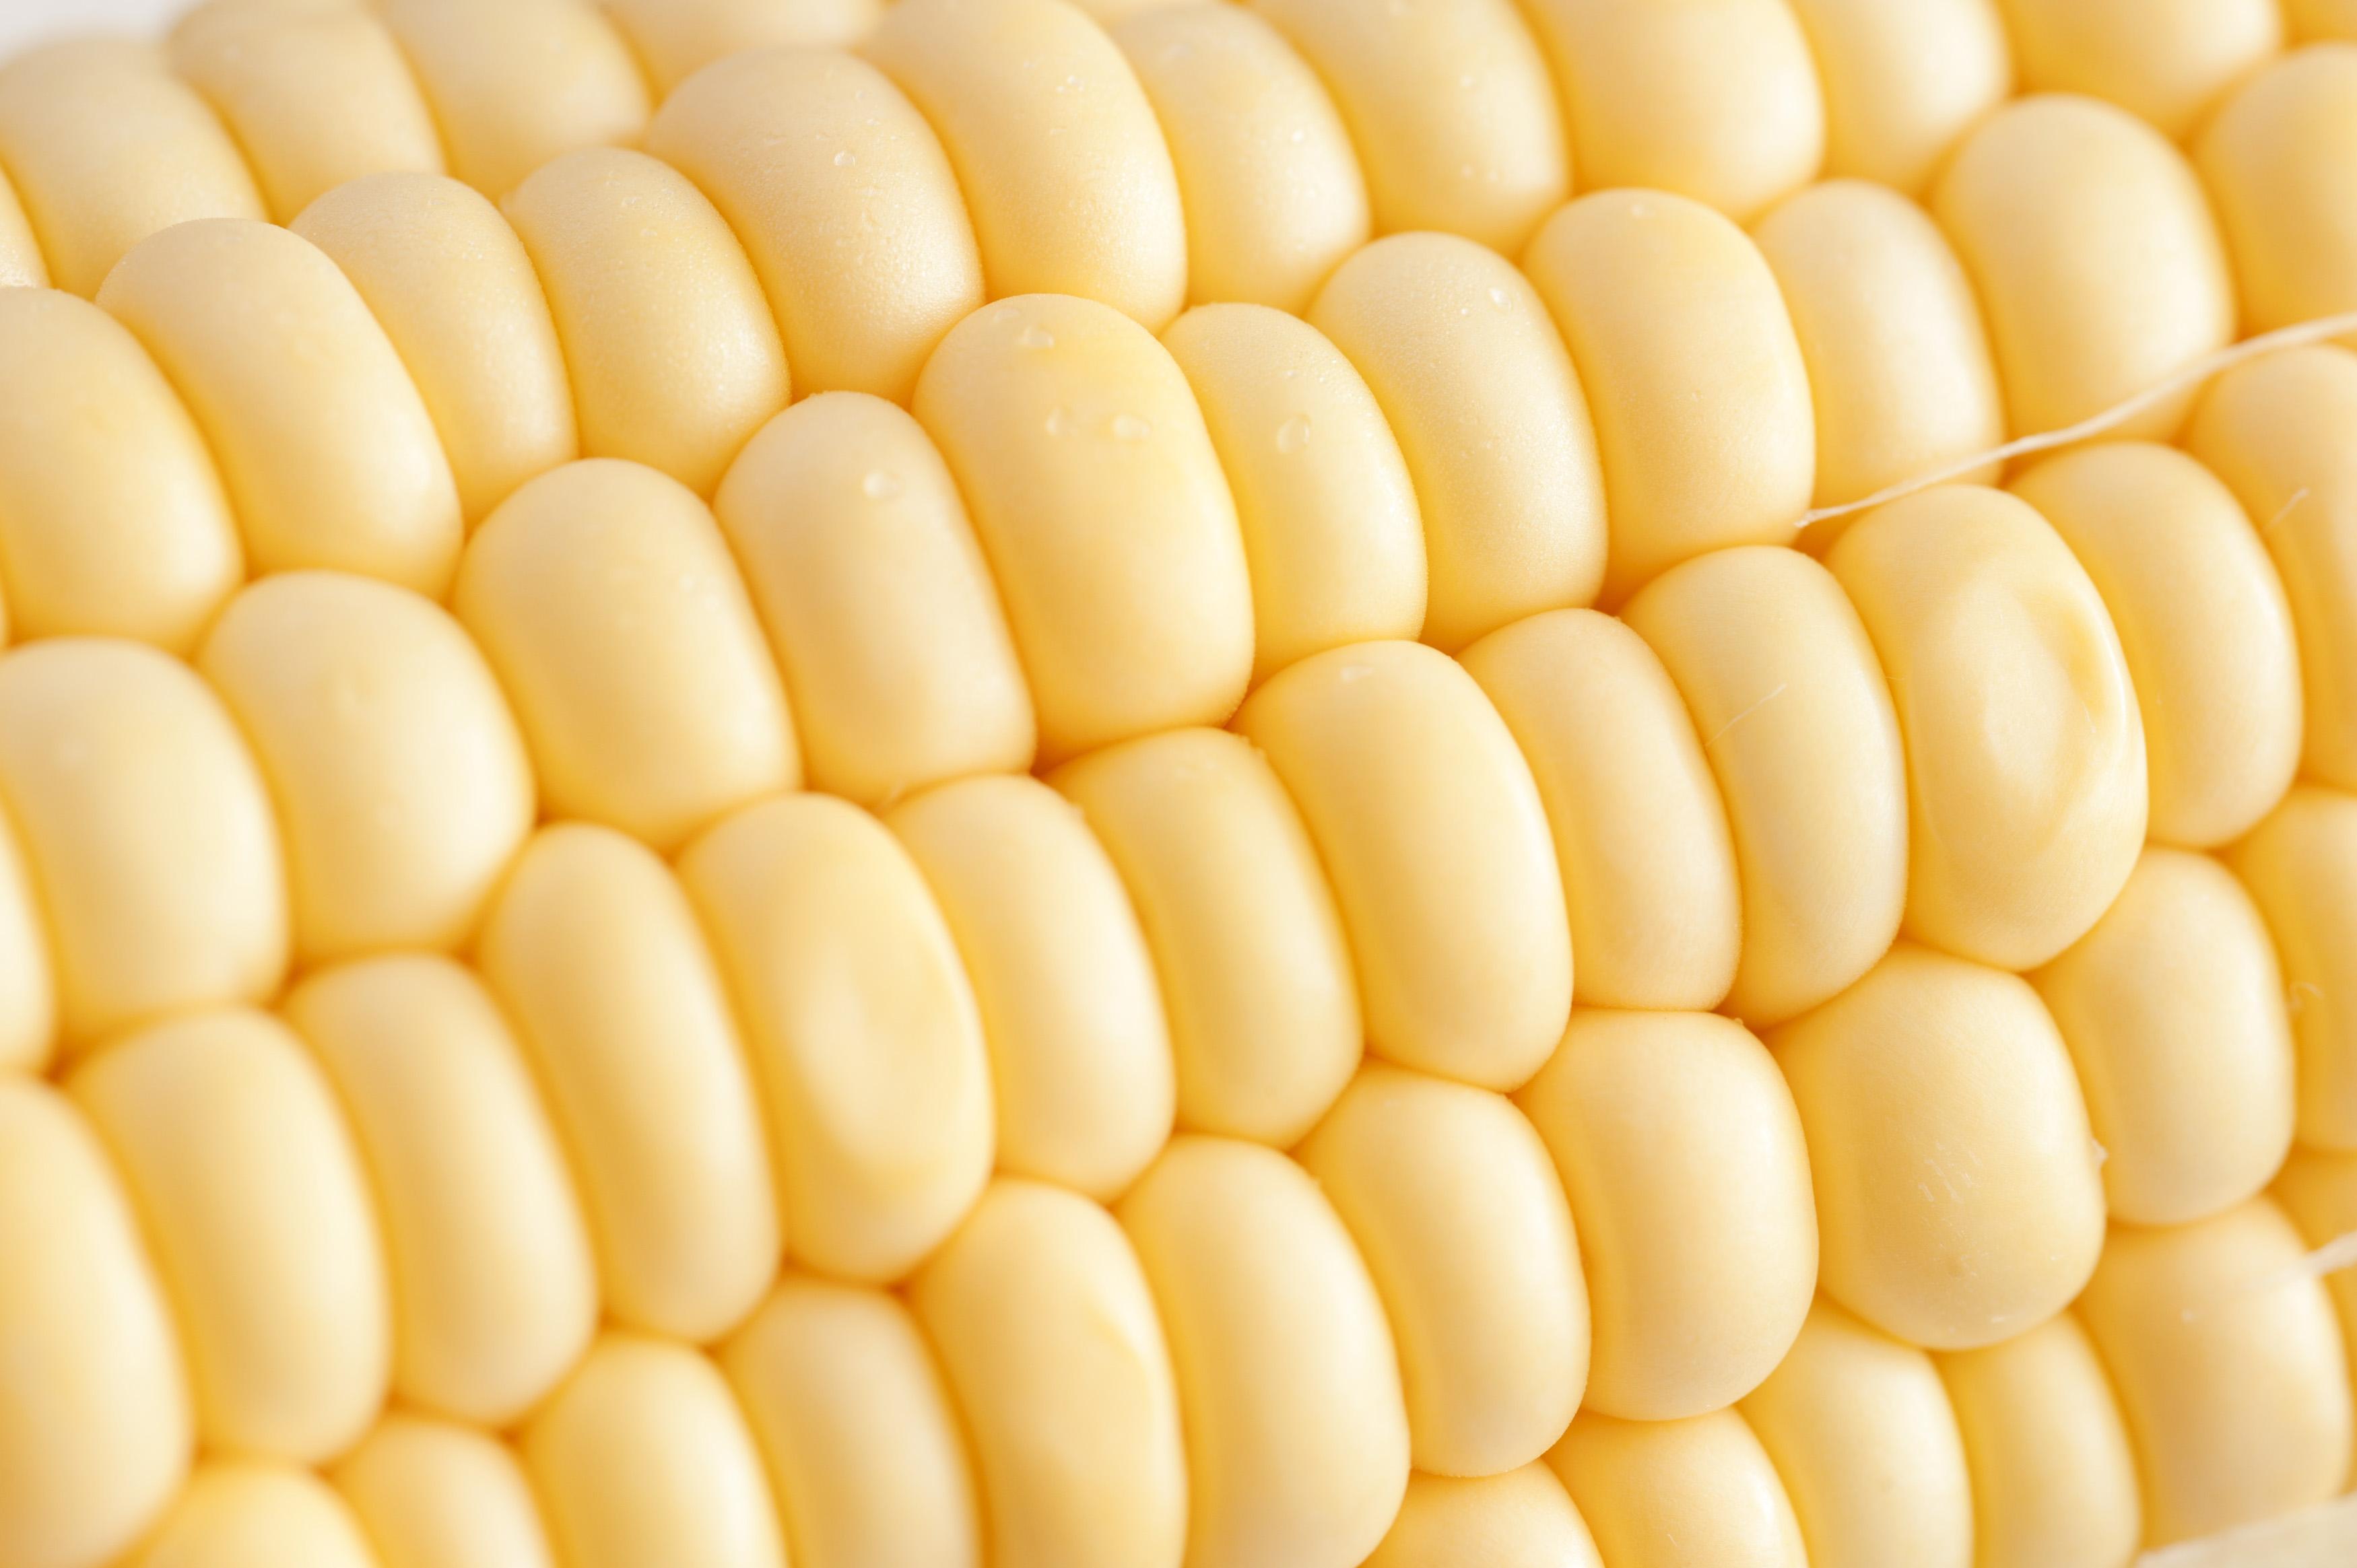 Maize texture photo